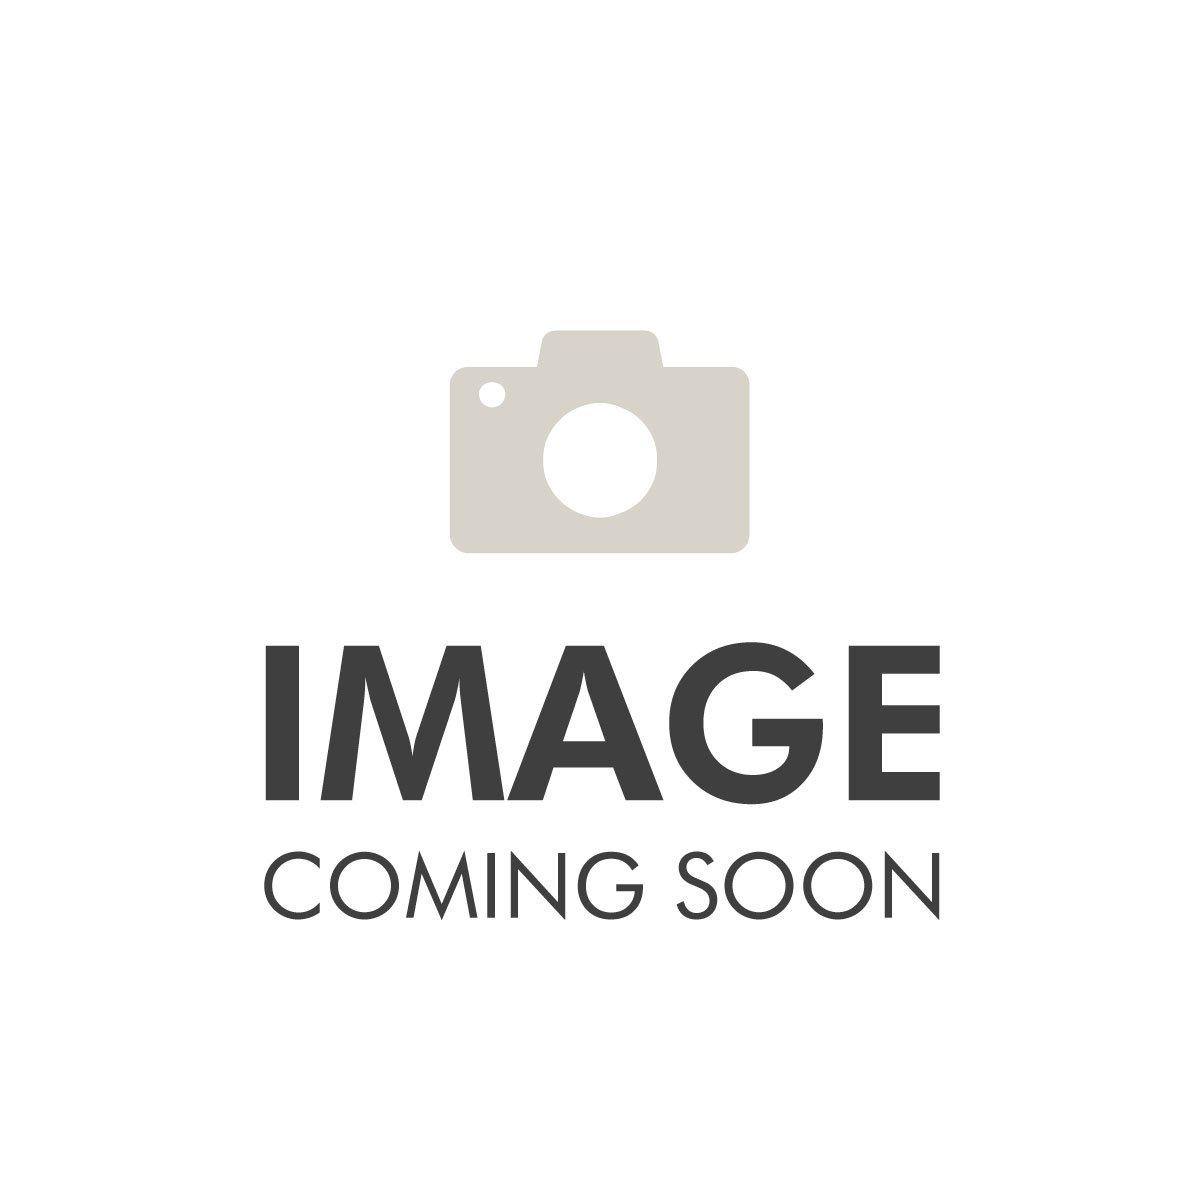 L'Oreal Loreal Anti Wrinkle Restoring Cream 55